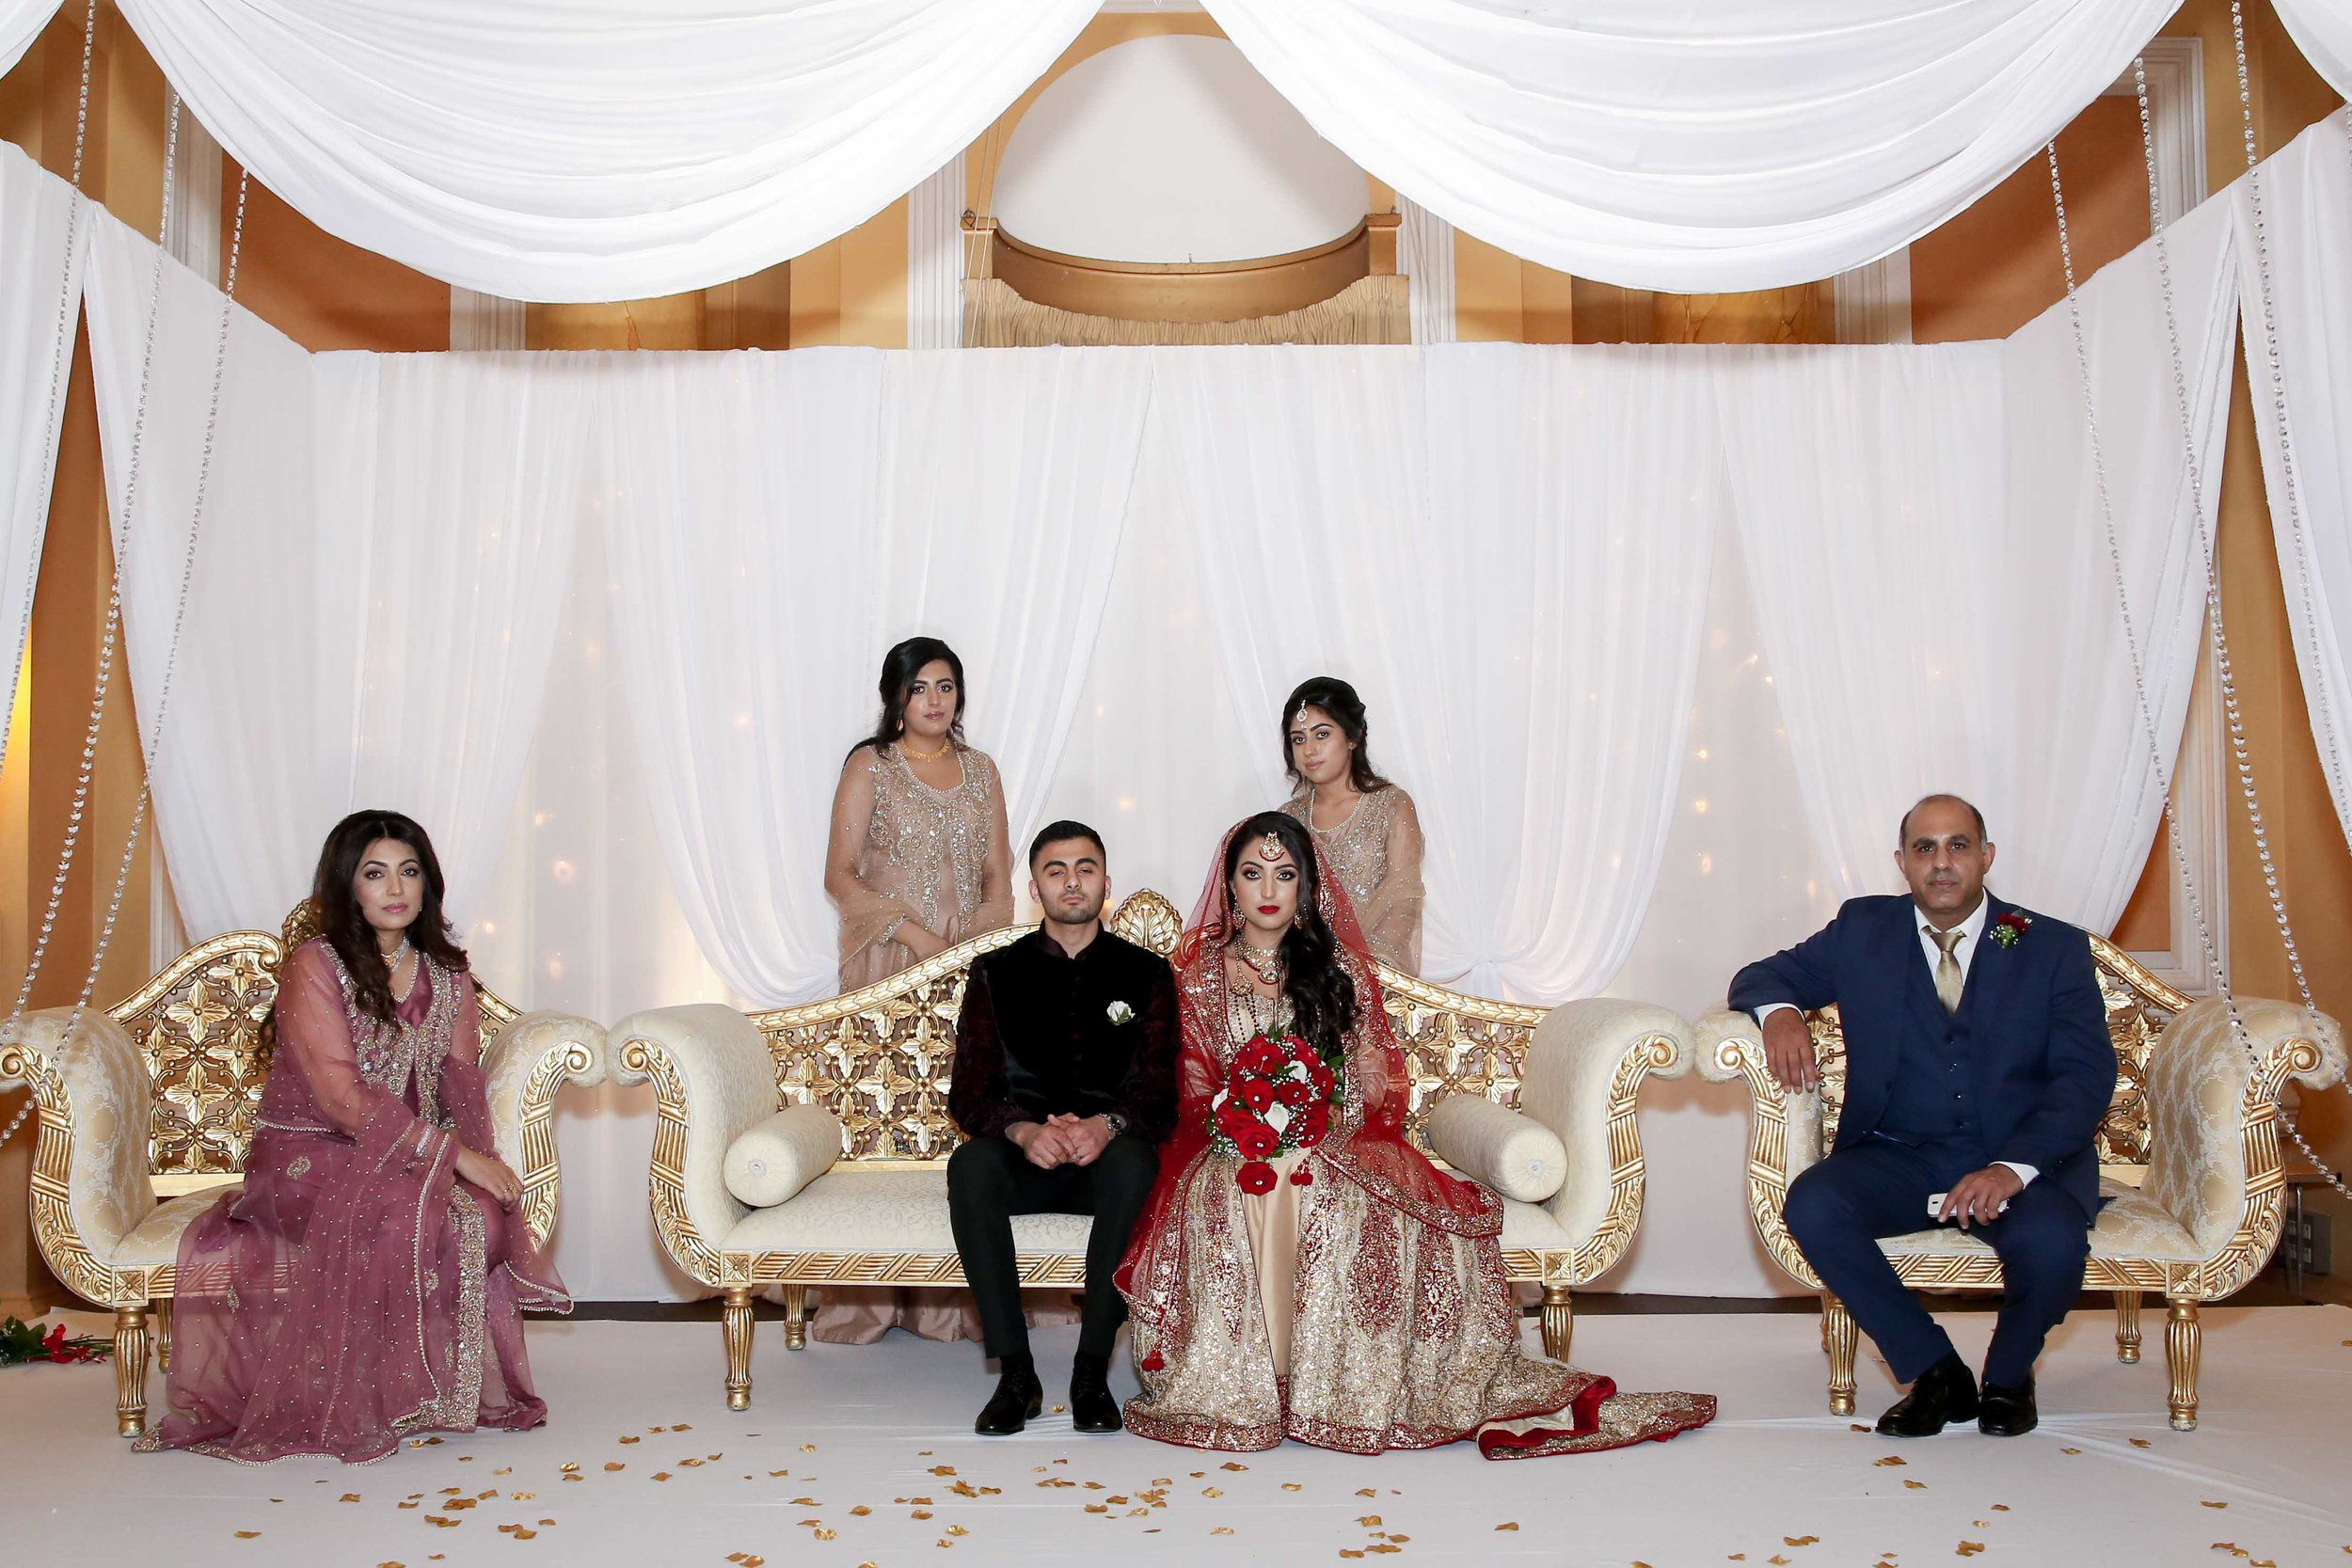 Female-asian-wedding-photographer-Cardiff-City-Hall-natalia-smith-photography-23.jpg